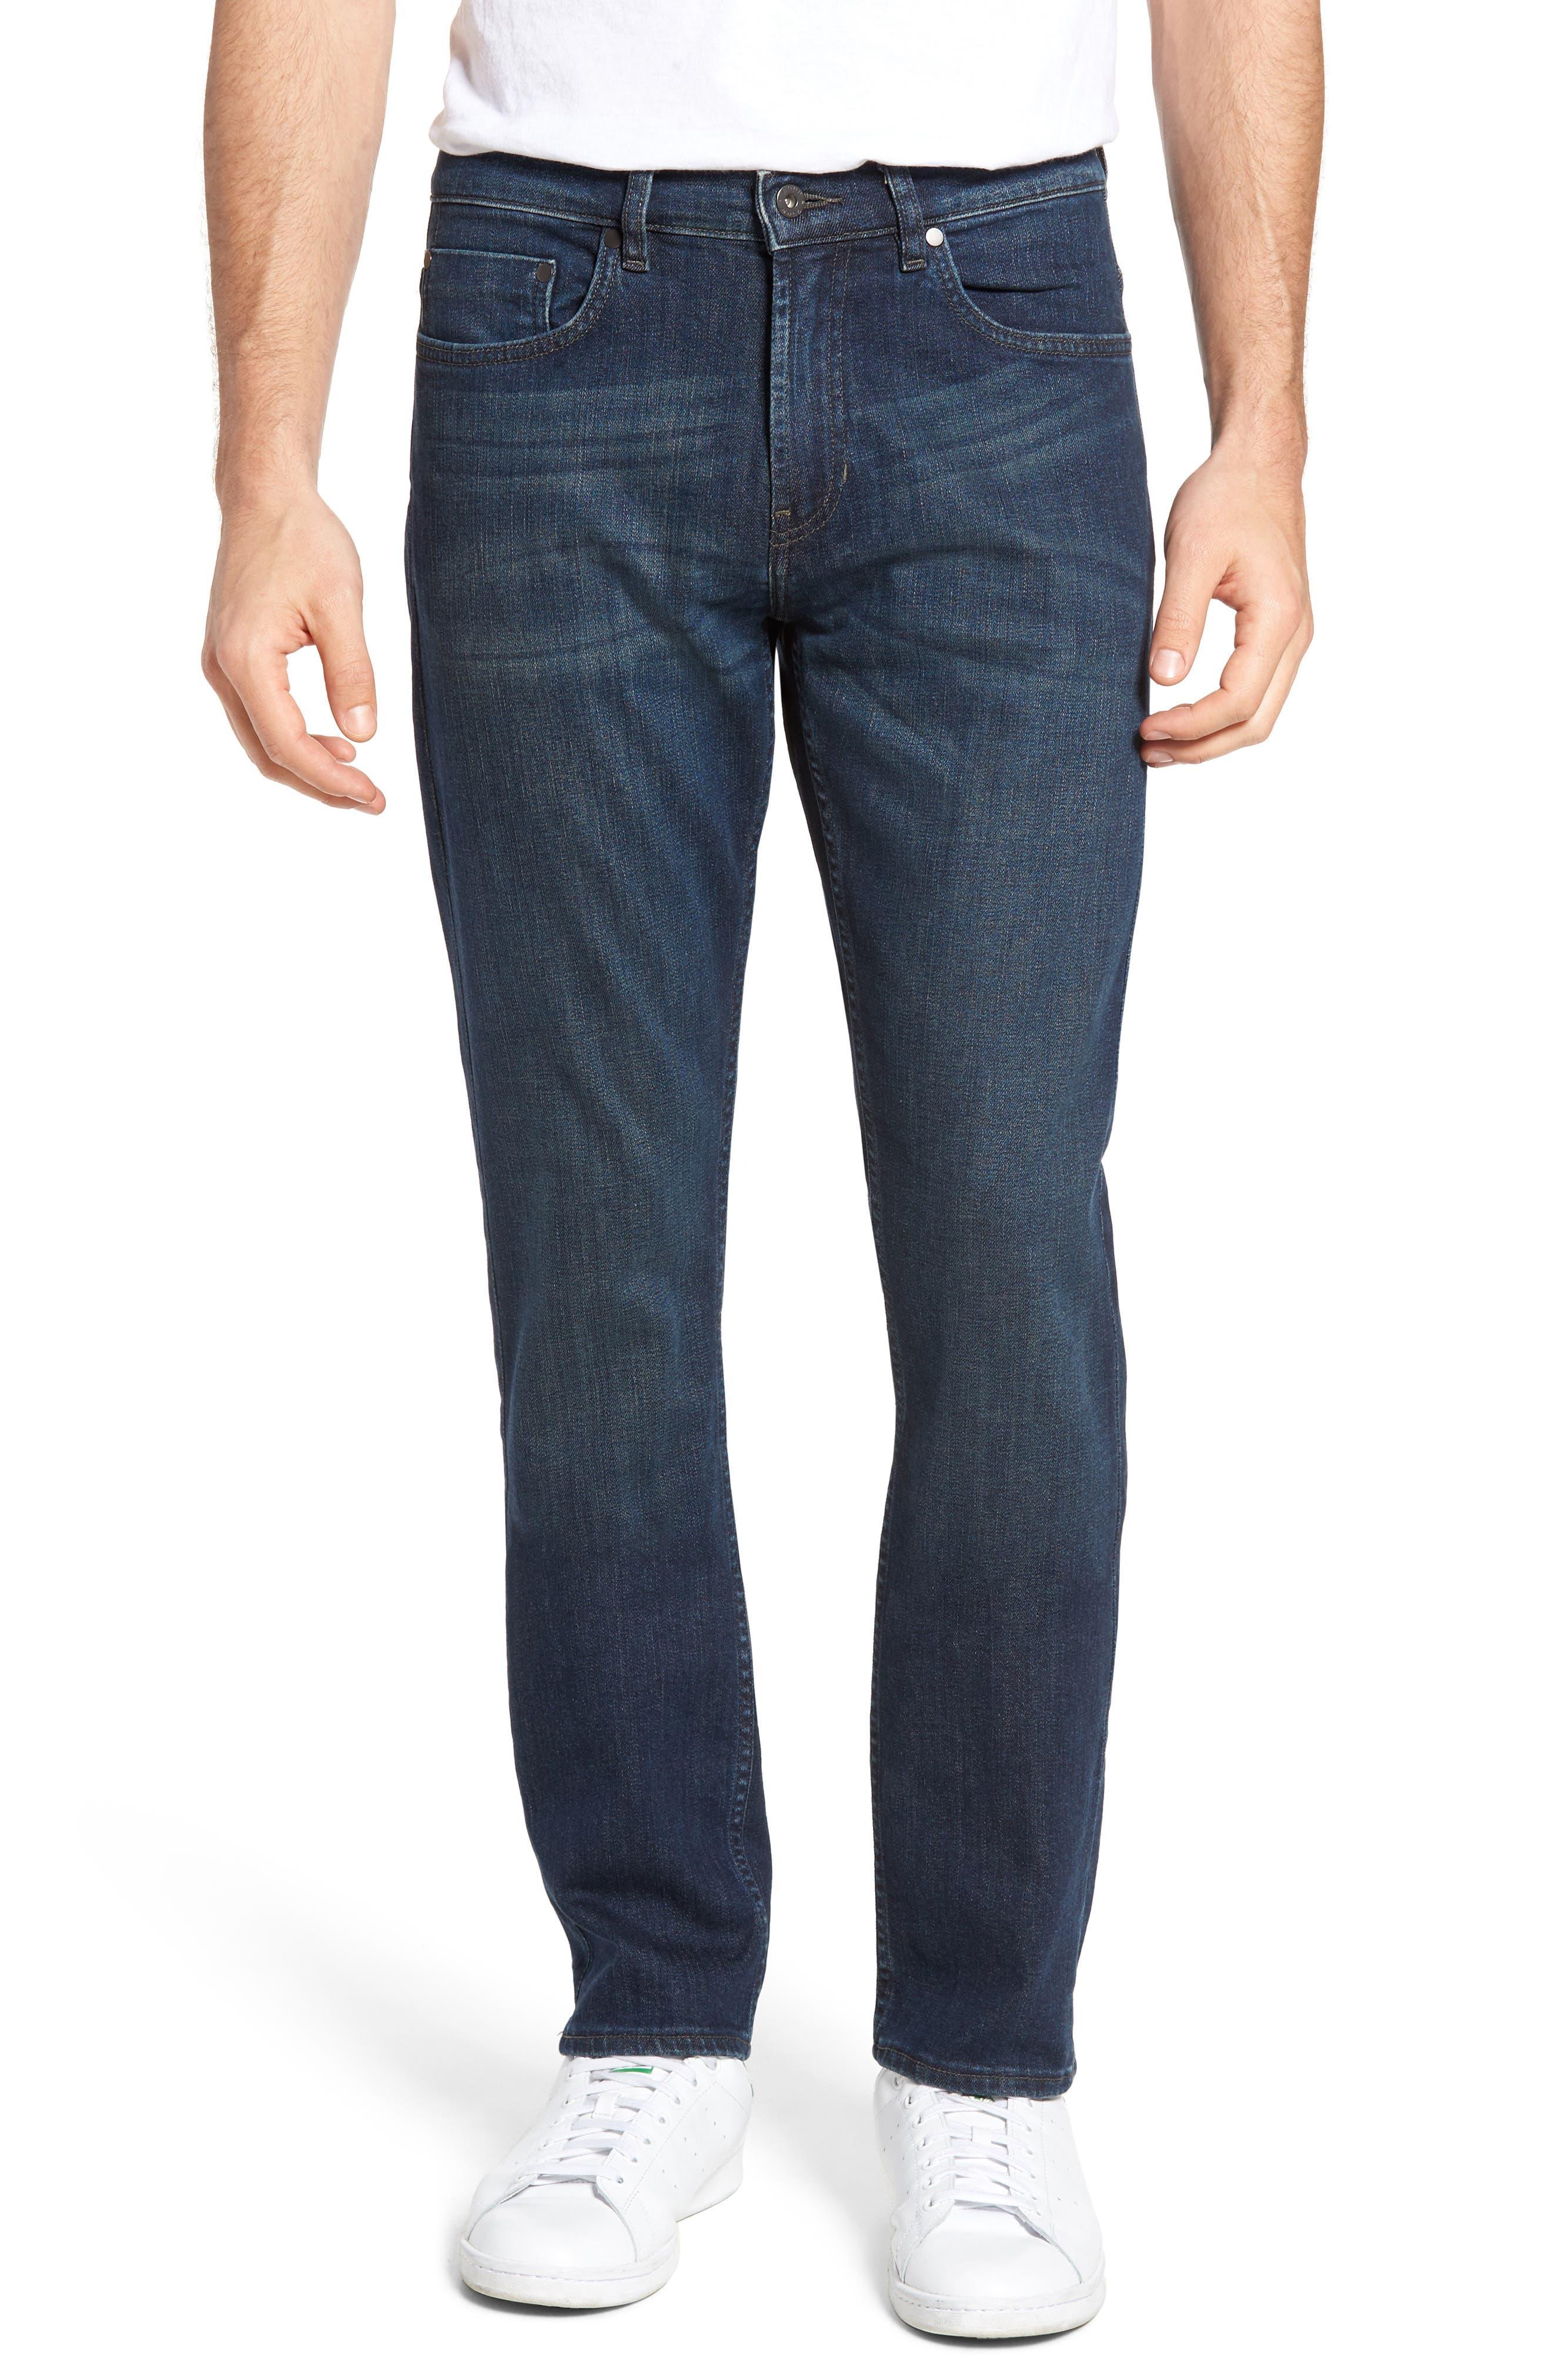 Main Image - Rodd & Gunn Calvert Slim Fit Jeans